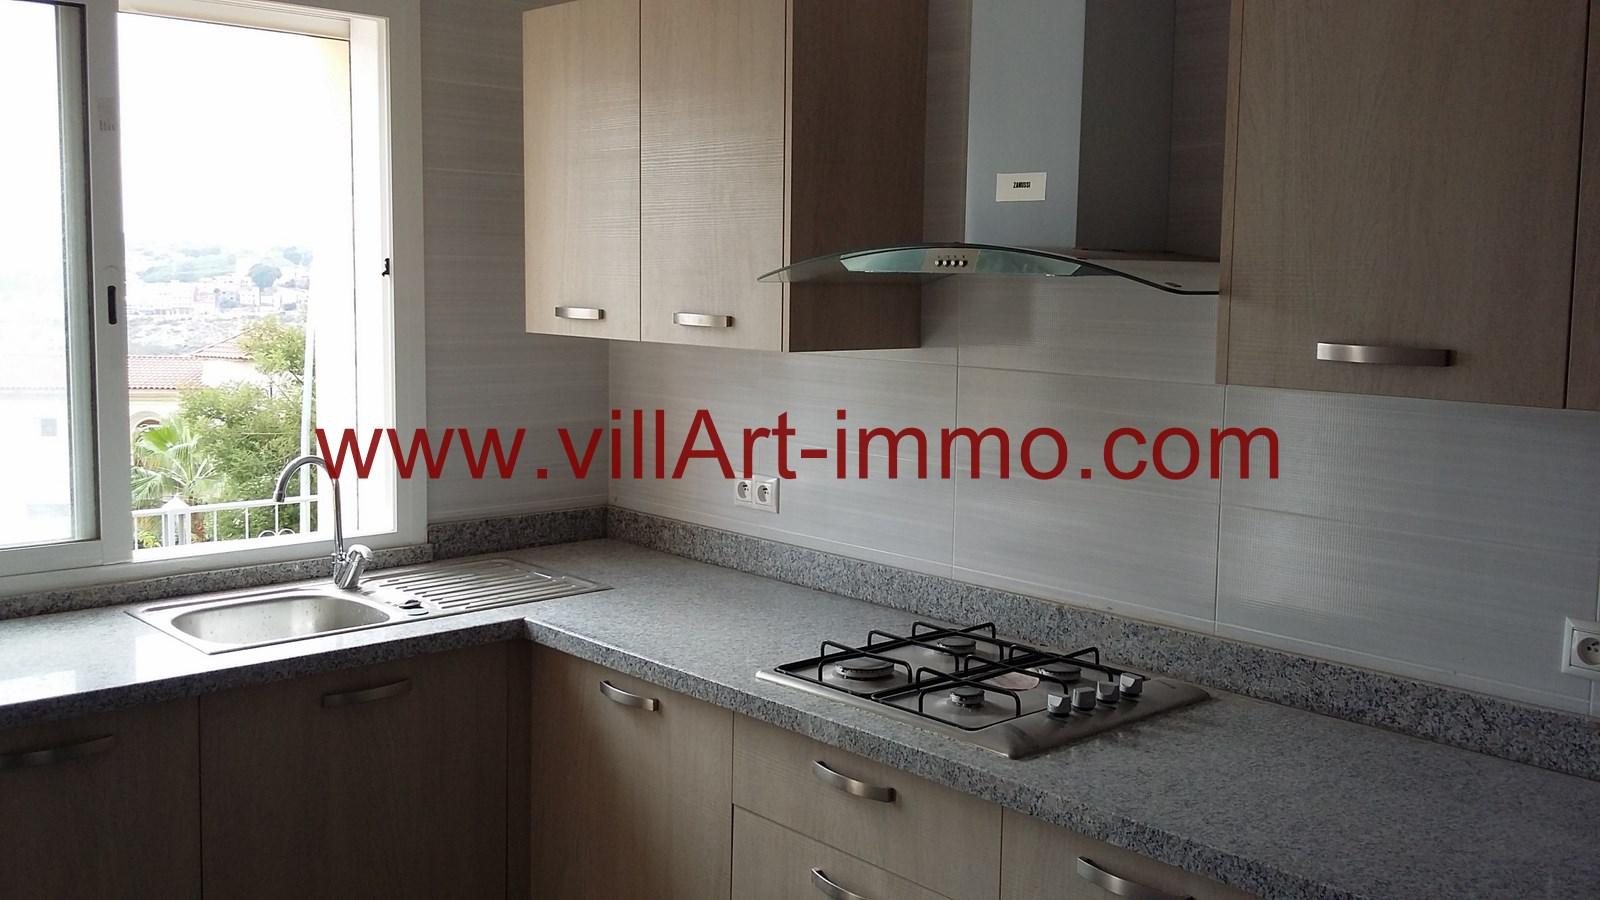 3-location-appartement-non-meuble-tanger-cuisine-1-l880-villart-immo